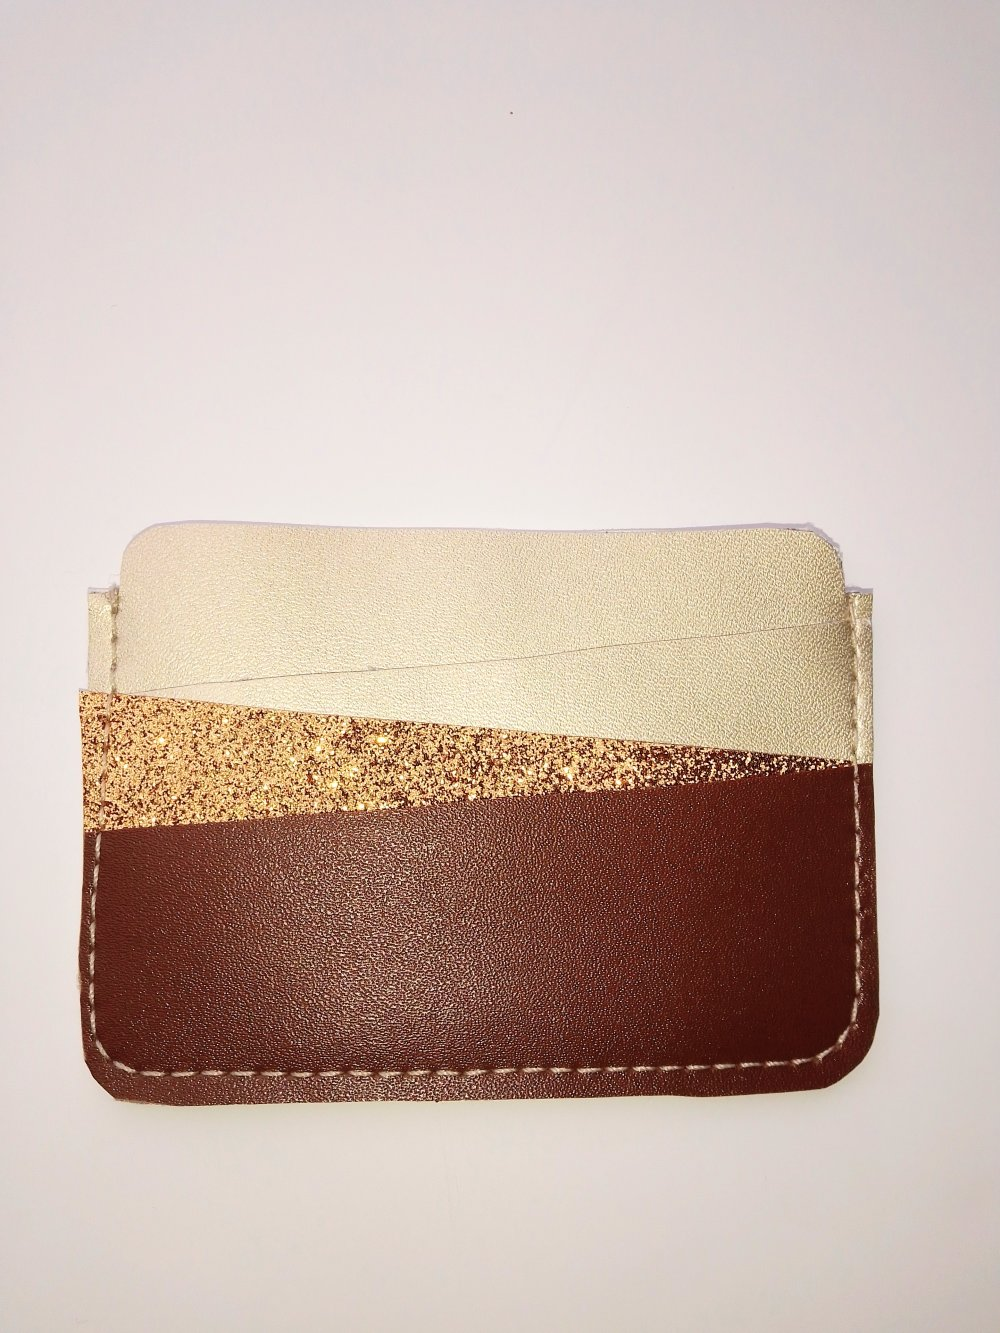 Porte-cartes simili cuir Doré